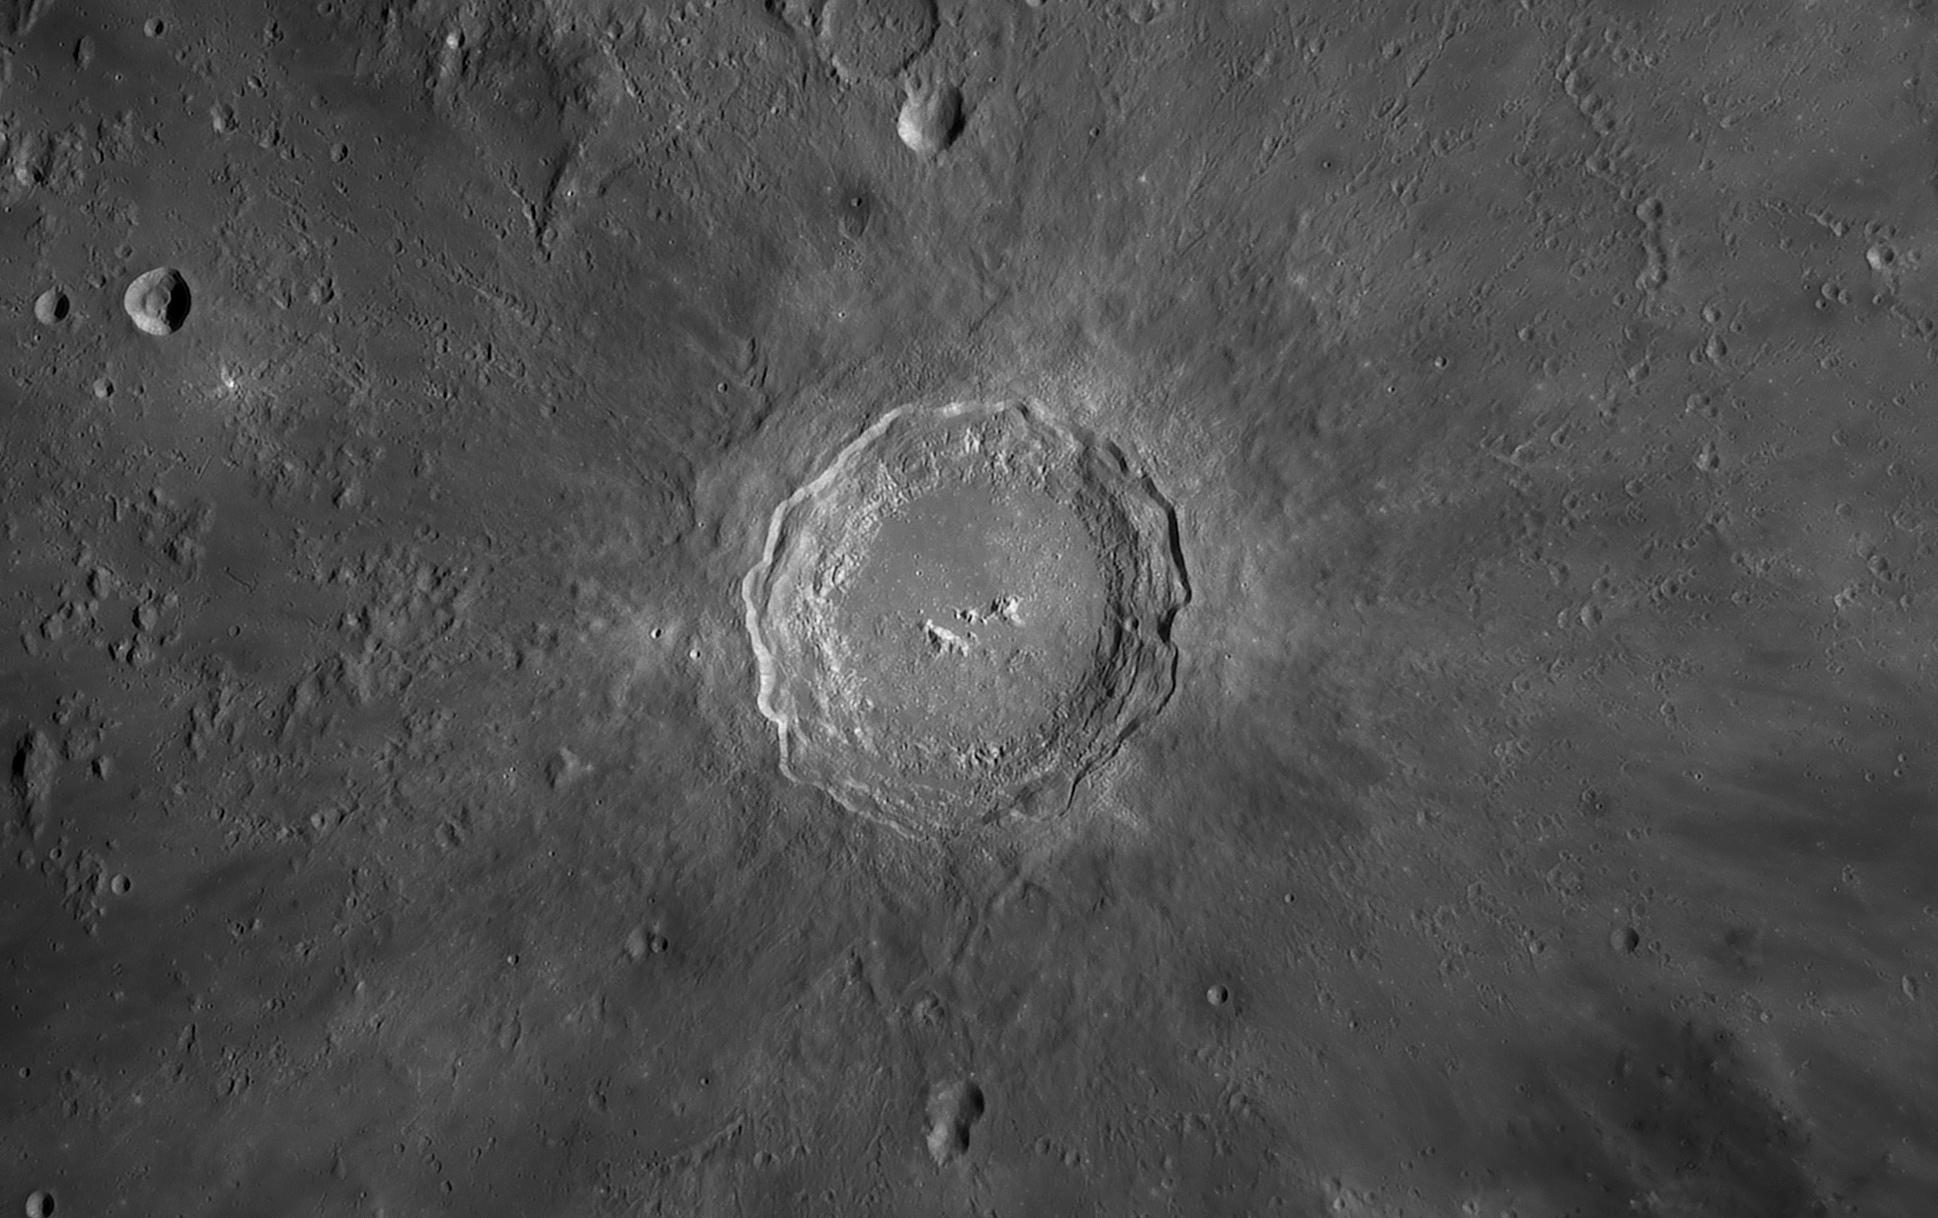 Copernicus au C14, le 4 Avril 2020: 700 images, caméra 174MM, Baader FFC, ADC Pierro Astro, filtre Astronomik orange 2c